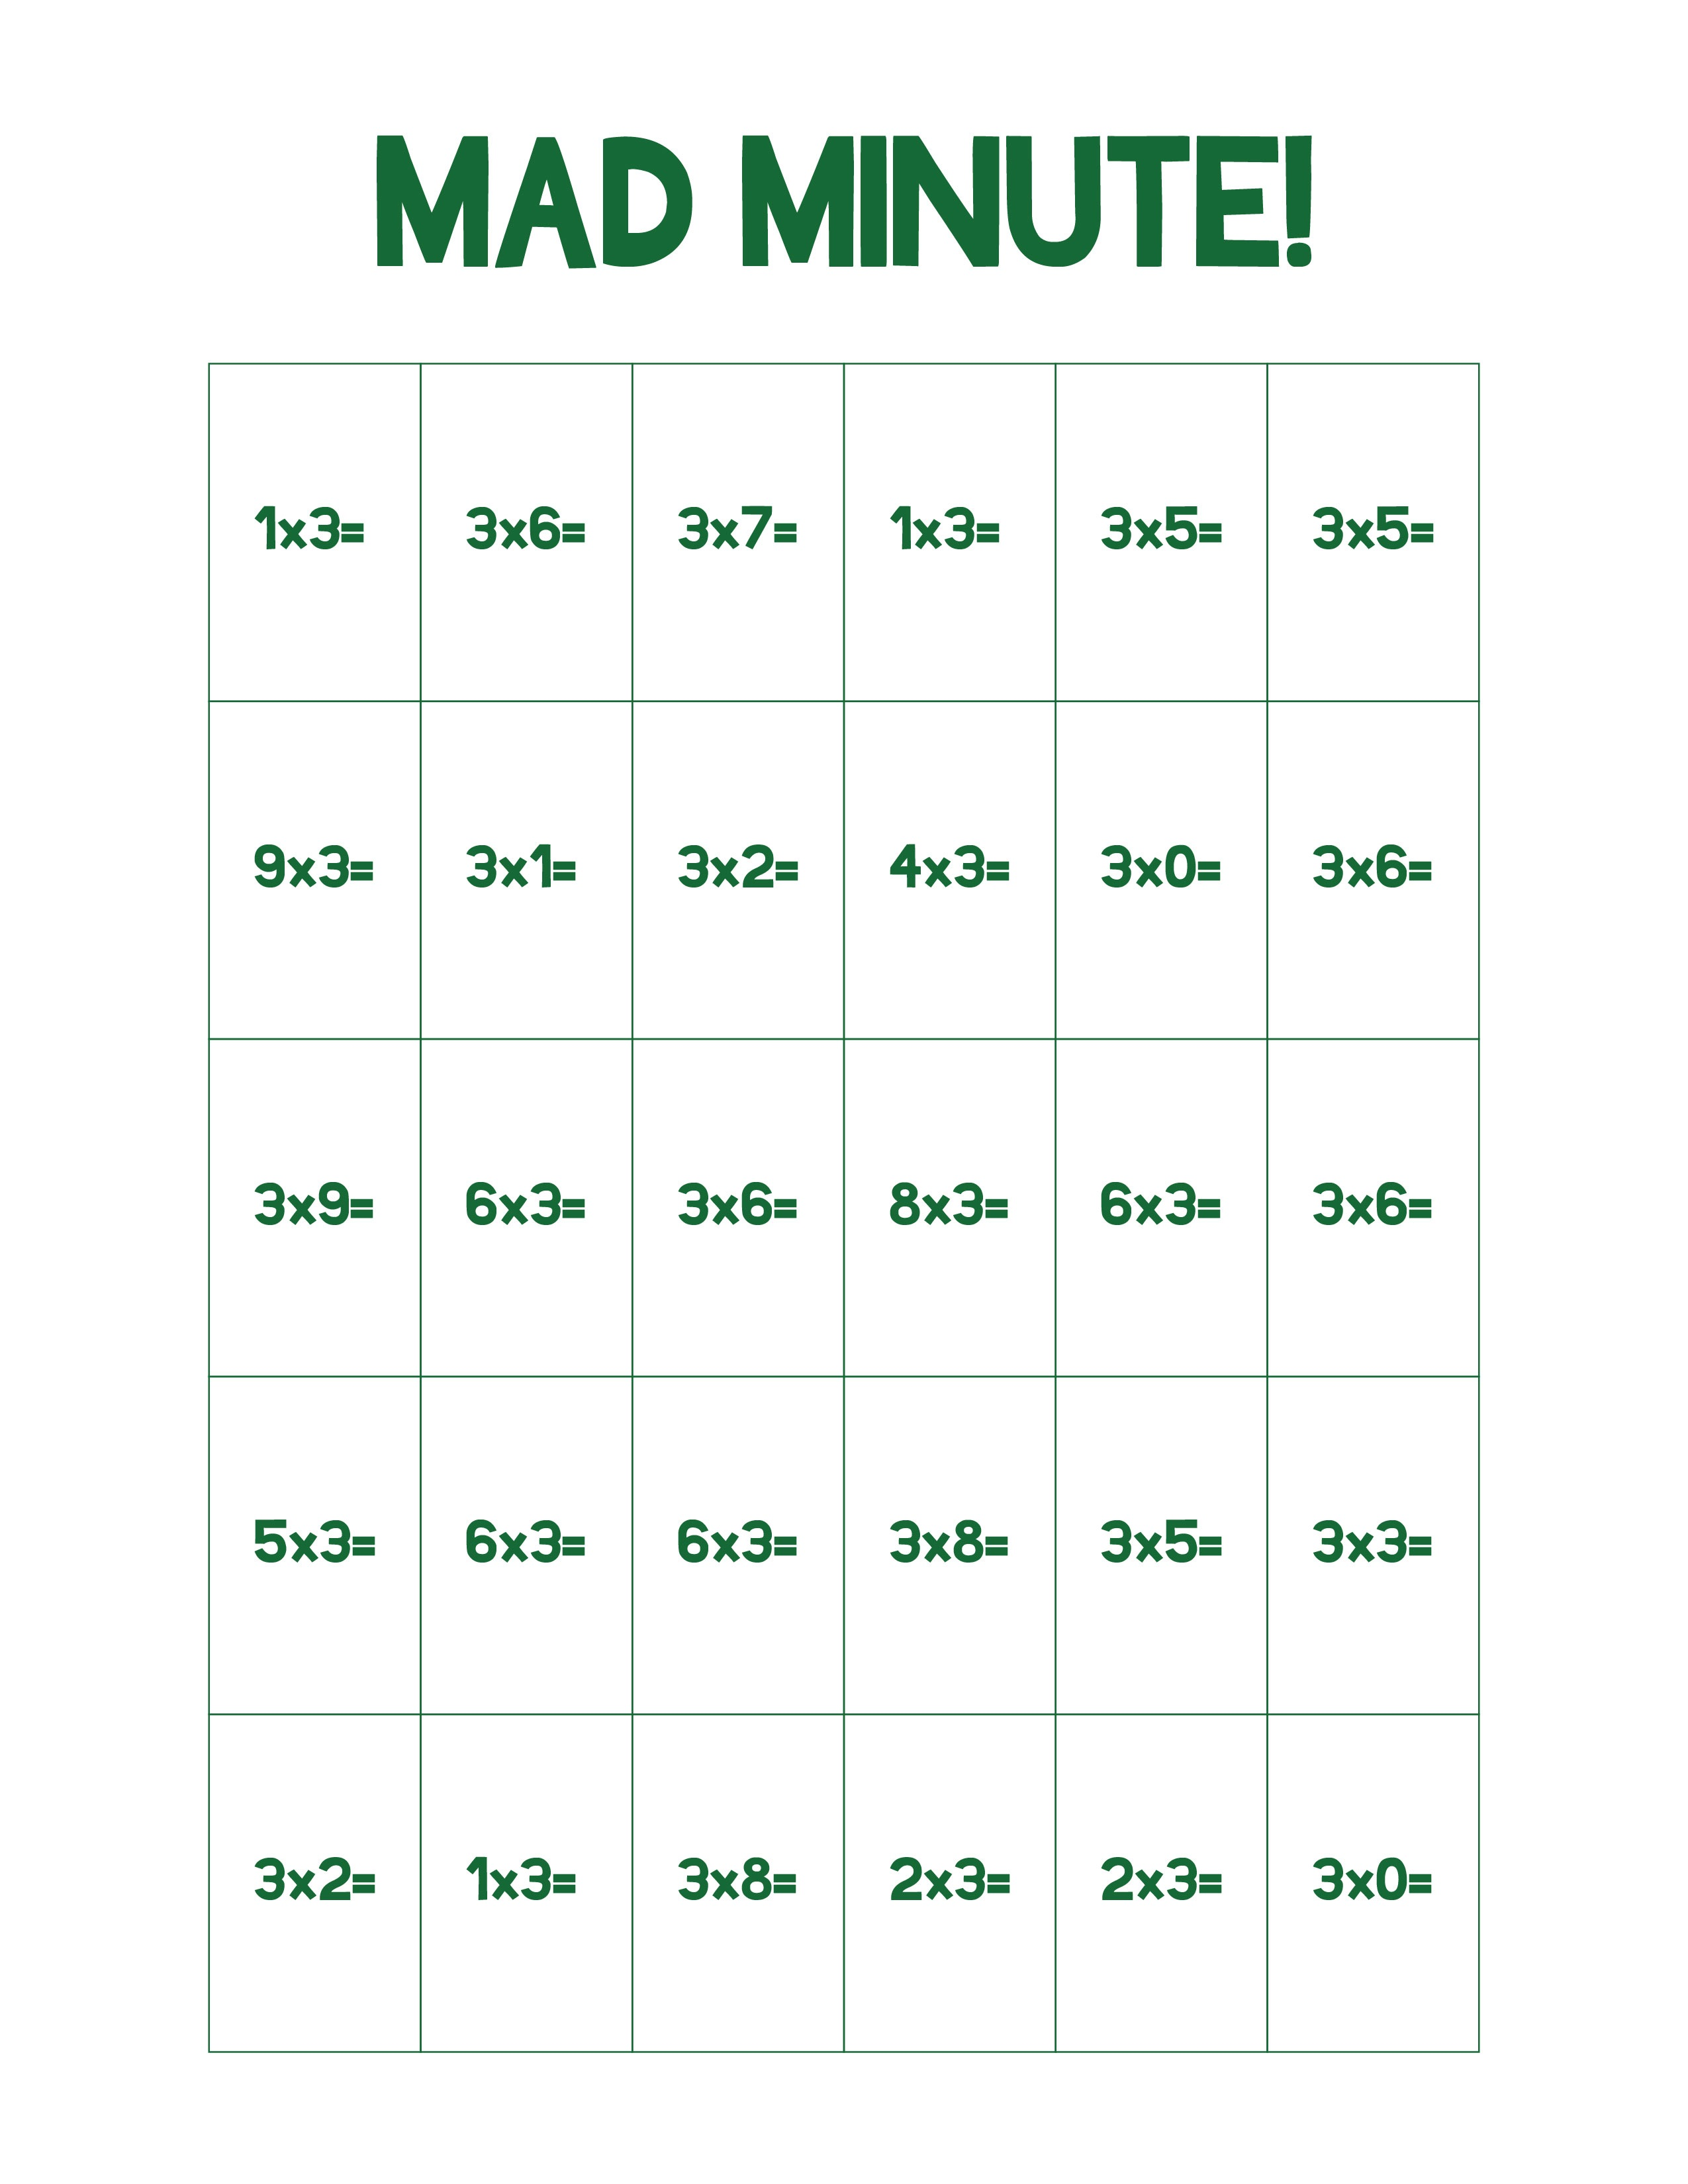 Printable Color Worksheet Math Games